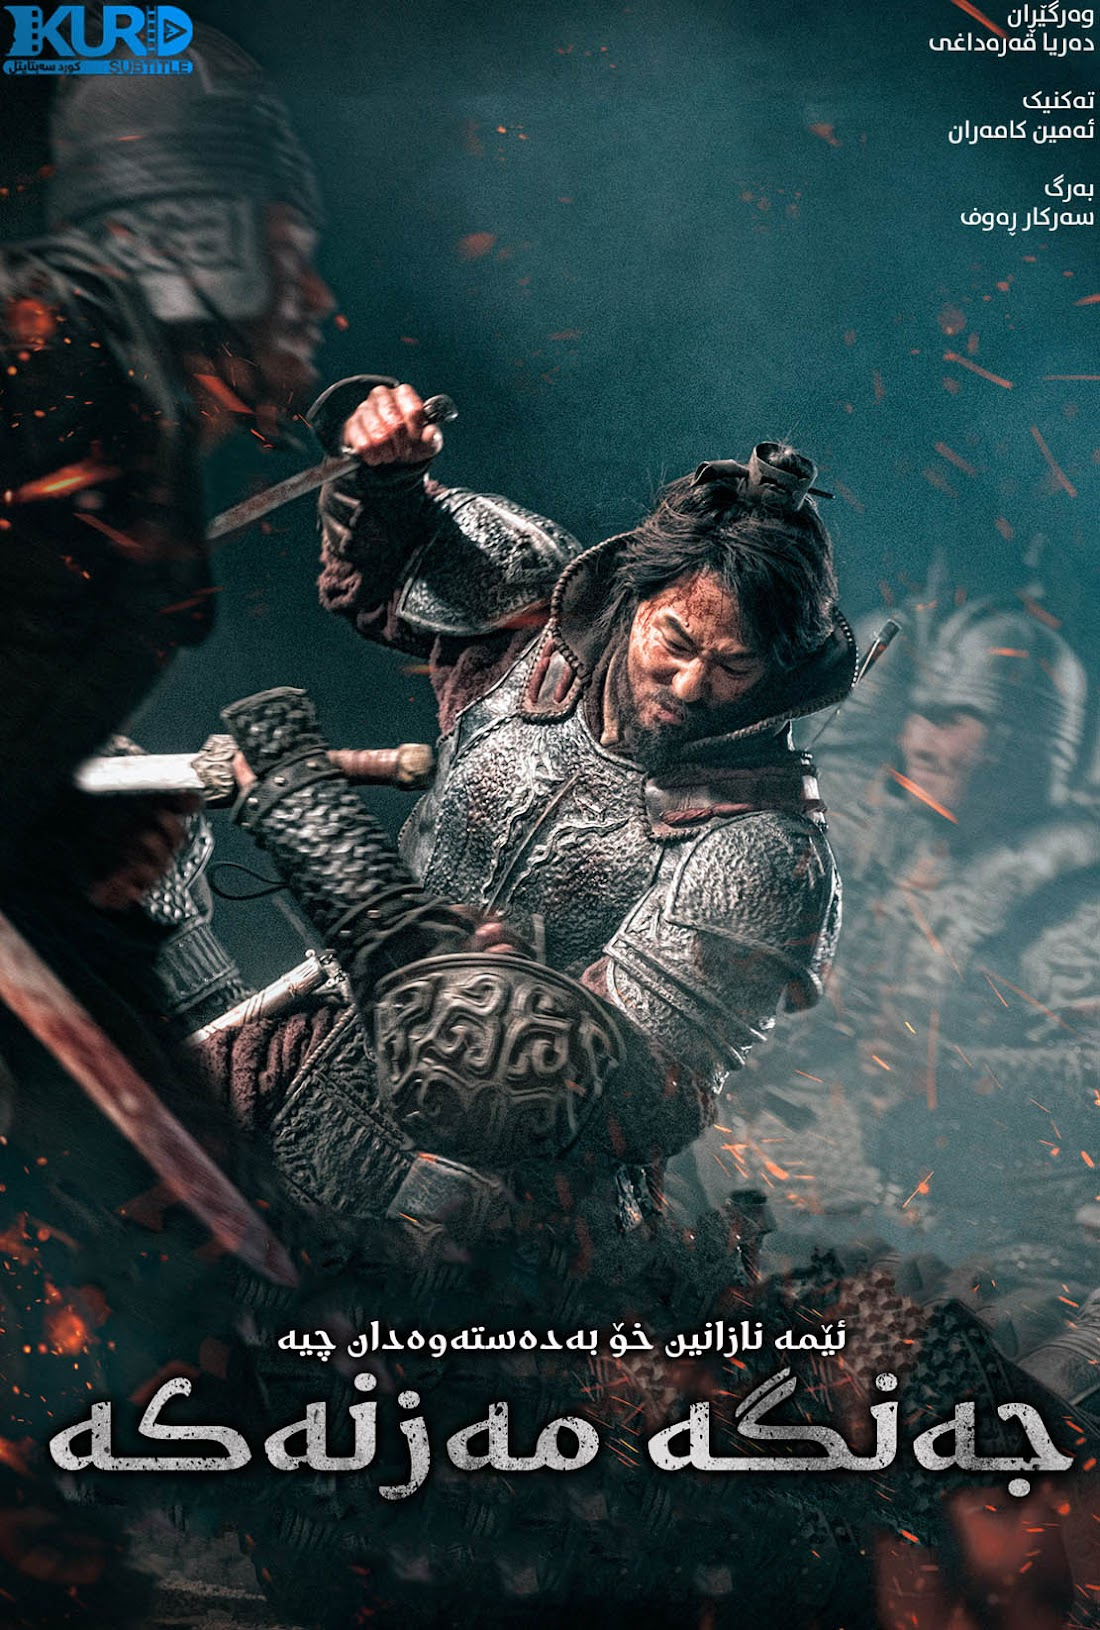 The Great Battle kurdish poster